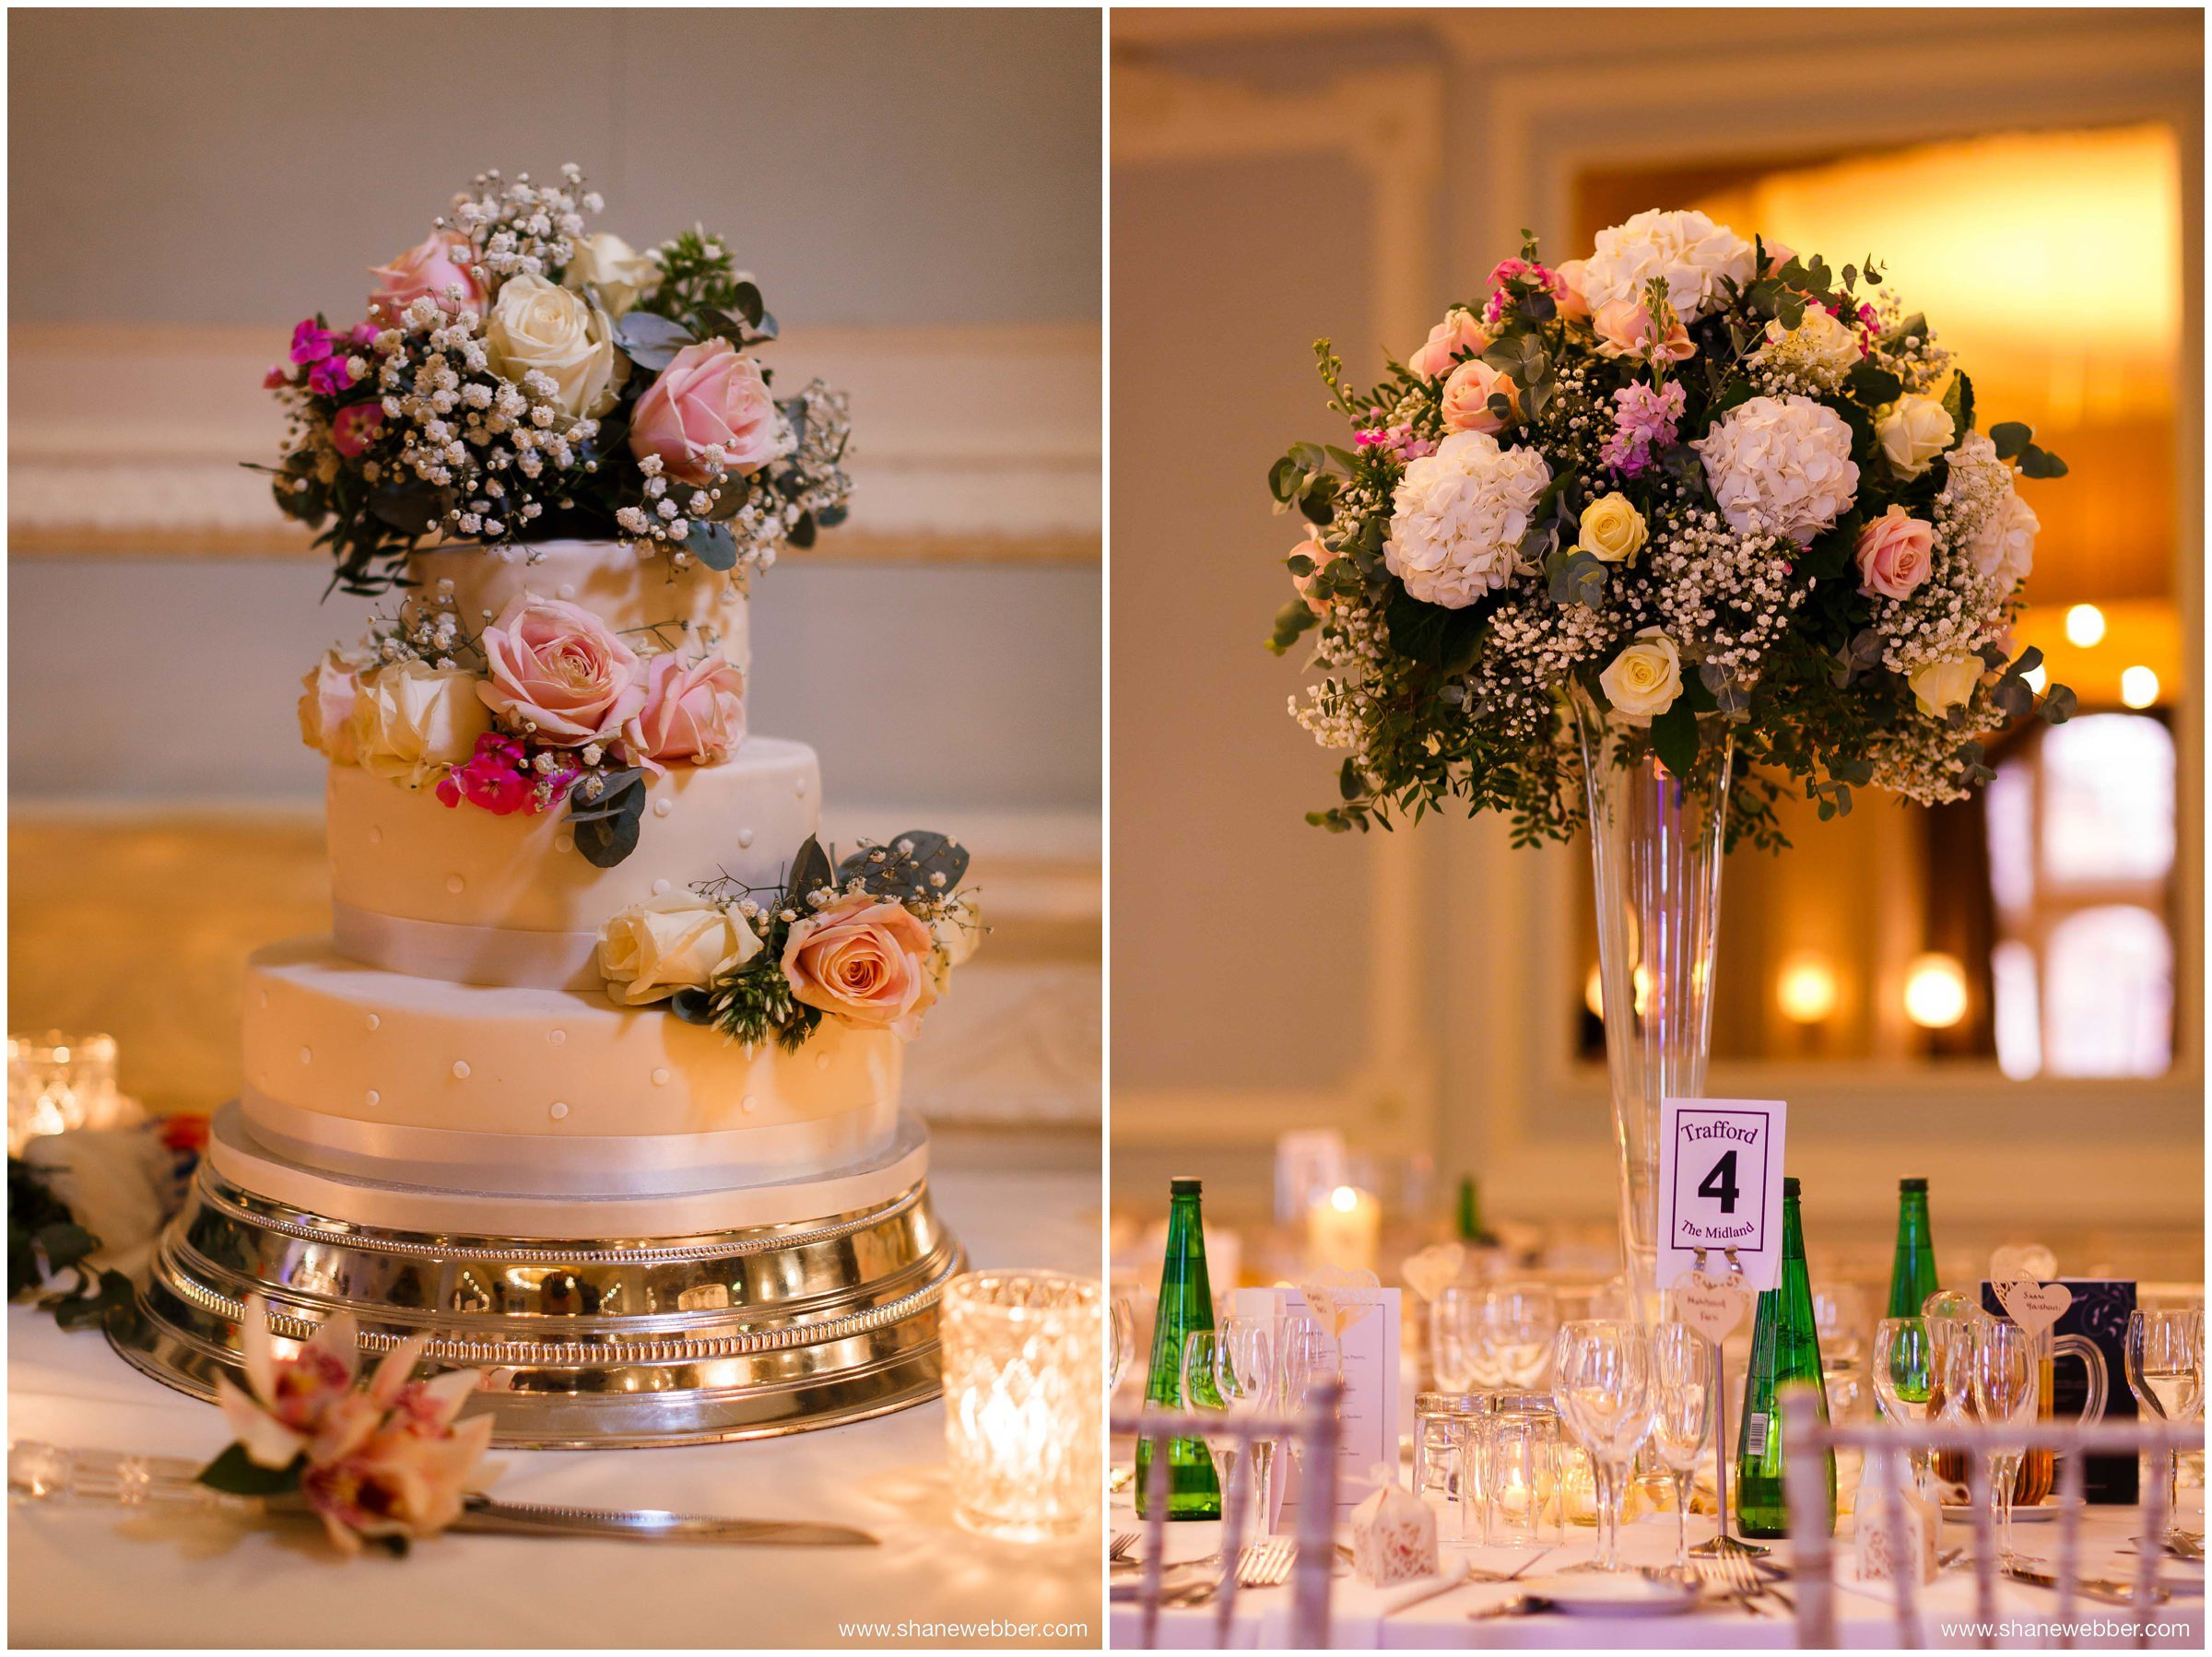 Midland hotel manchester wedding photography springbank flowers mightylinksfo Choice Image